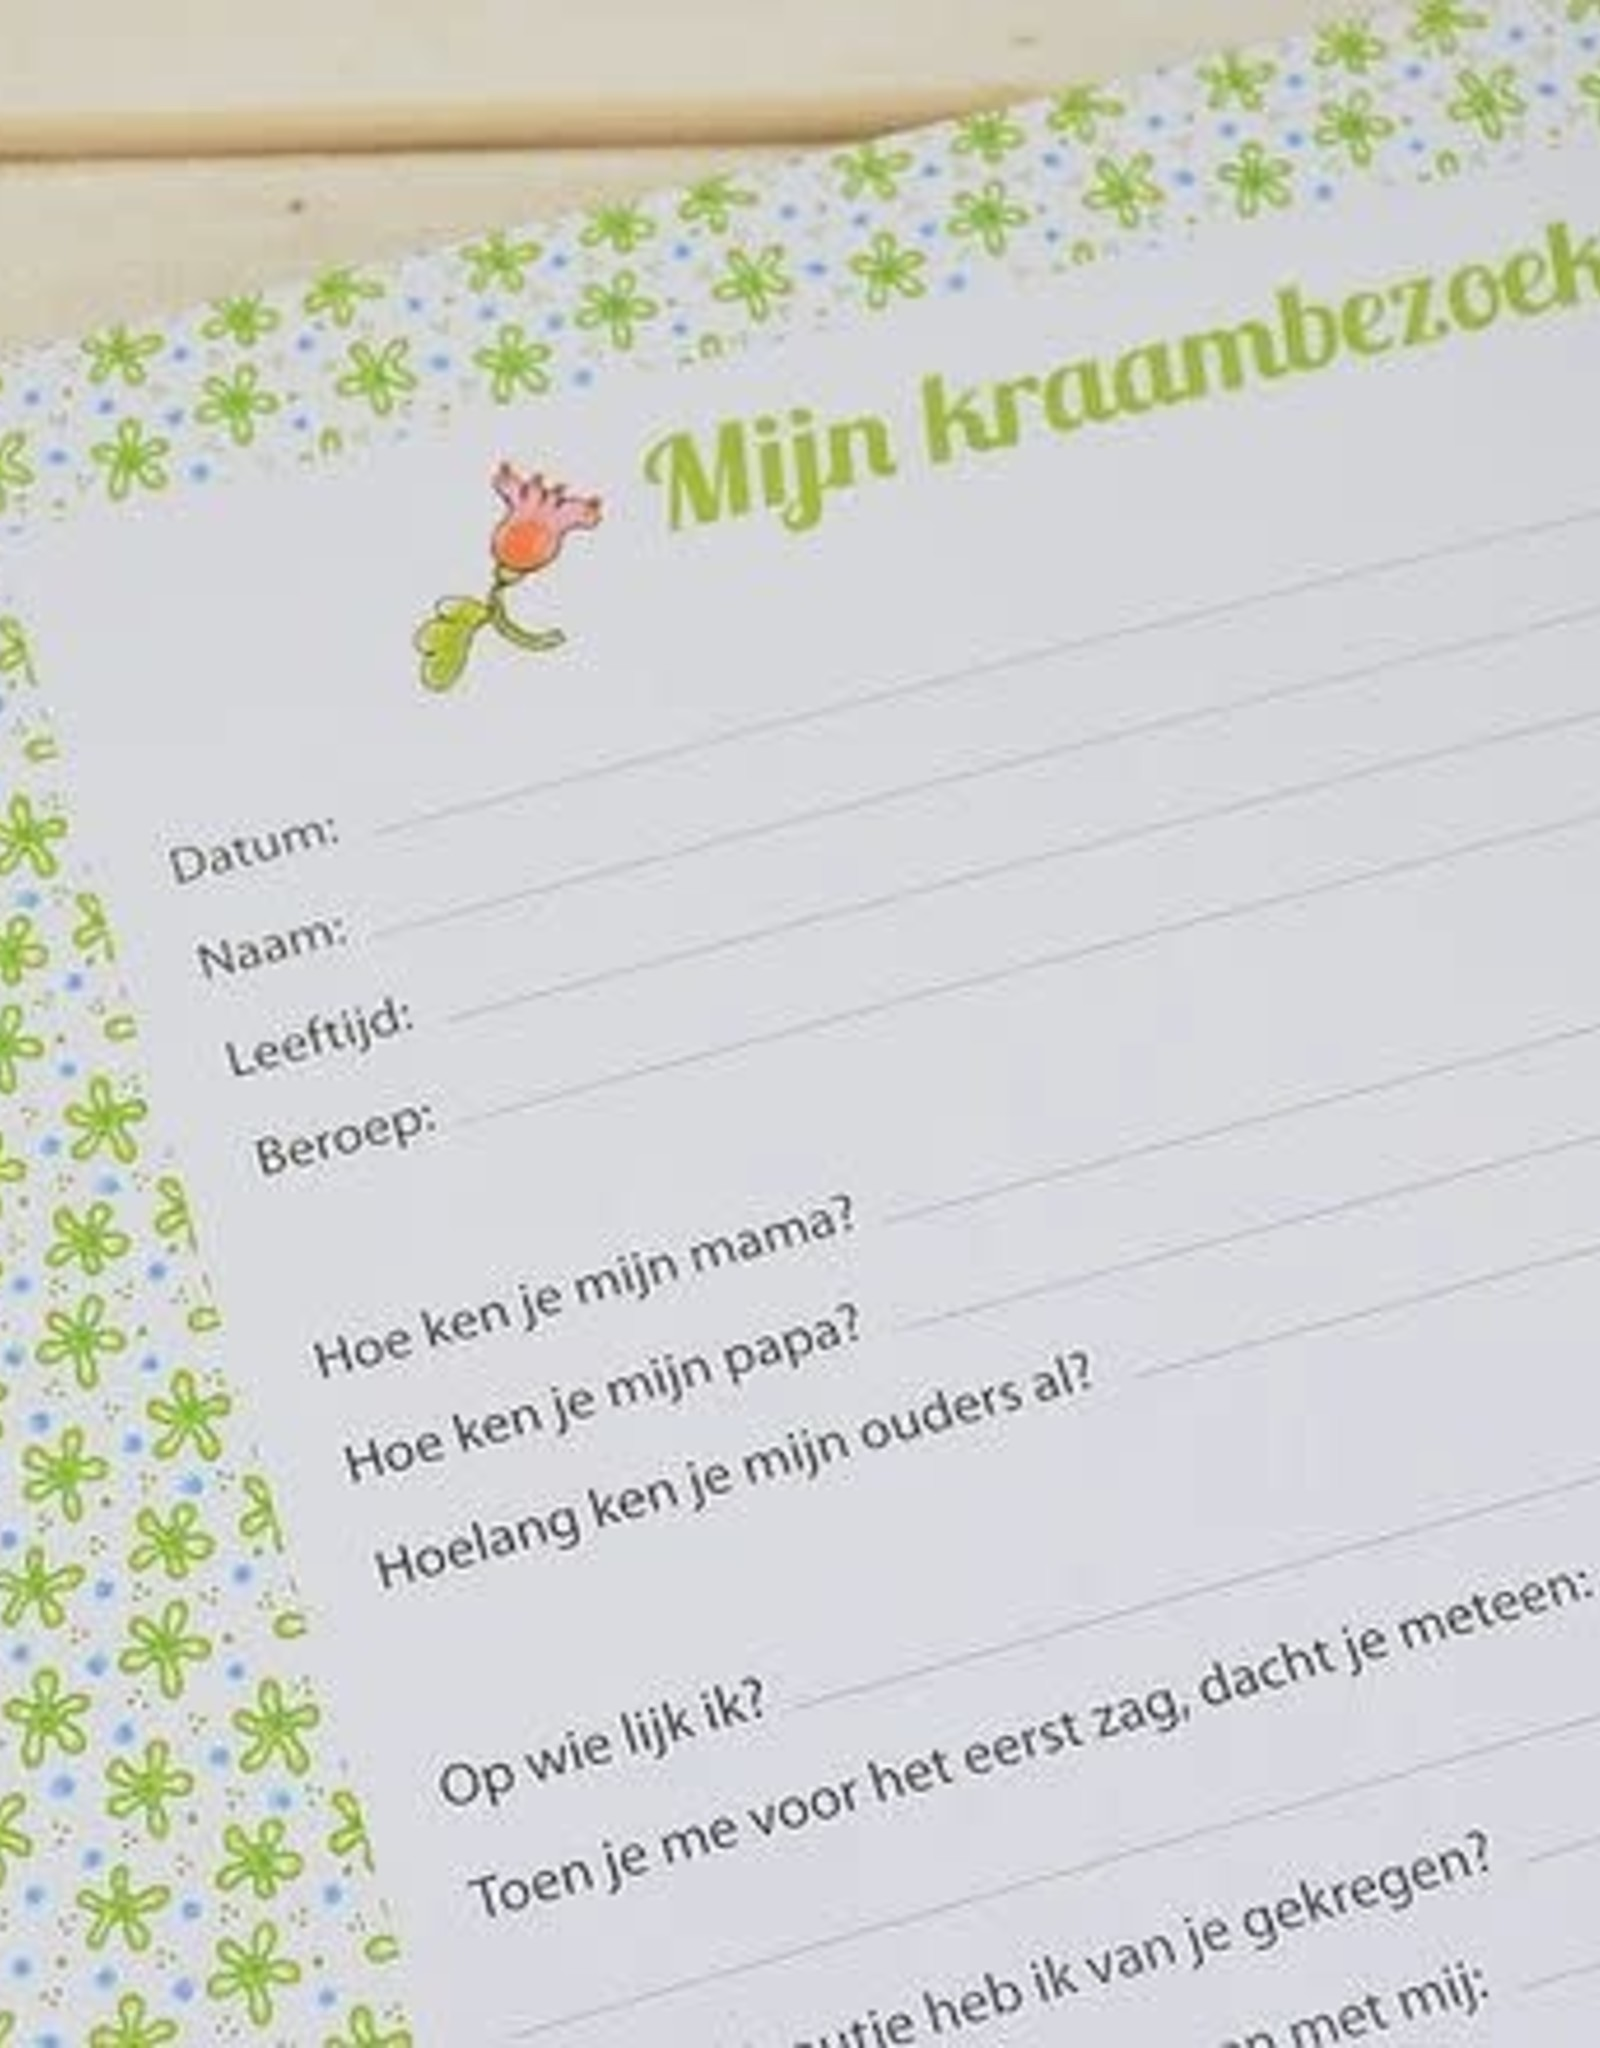 Pauline Oud Kraambezoekboek - Pauline Oud